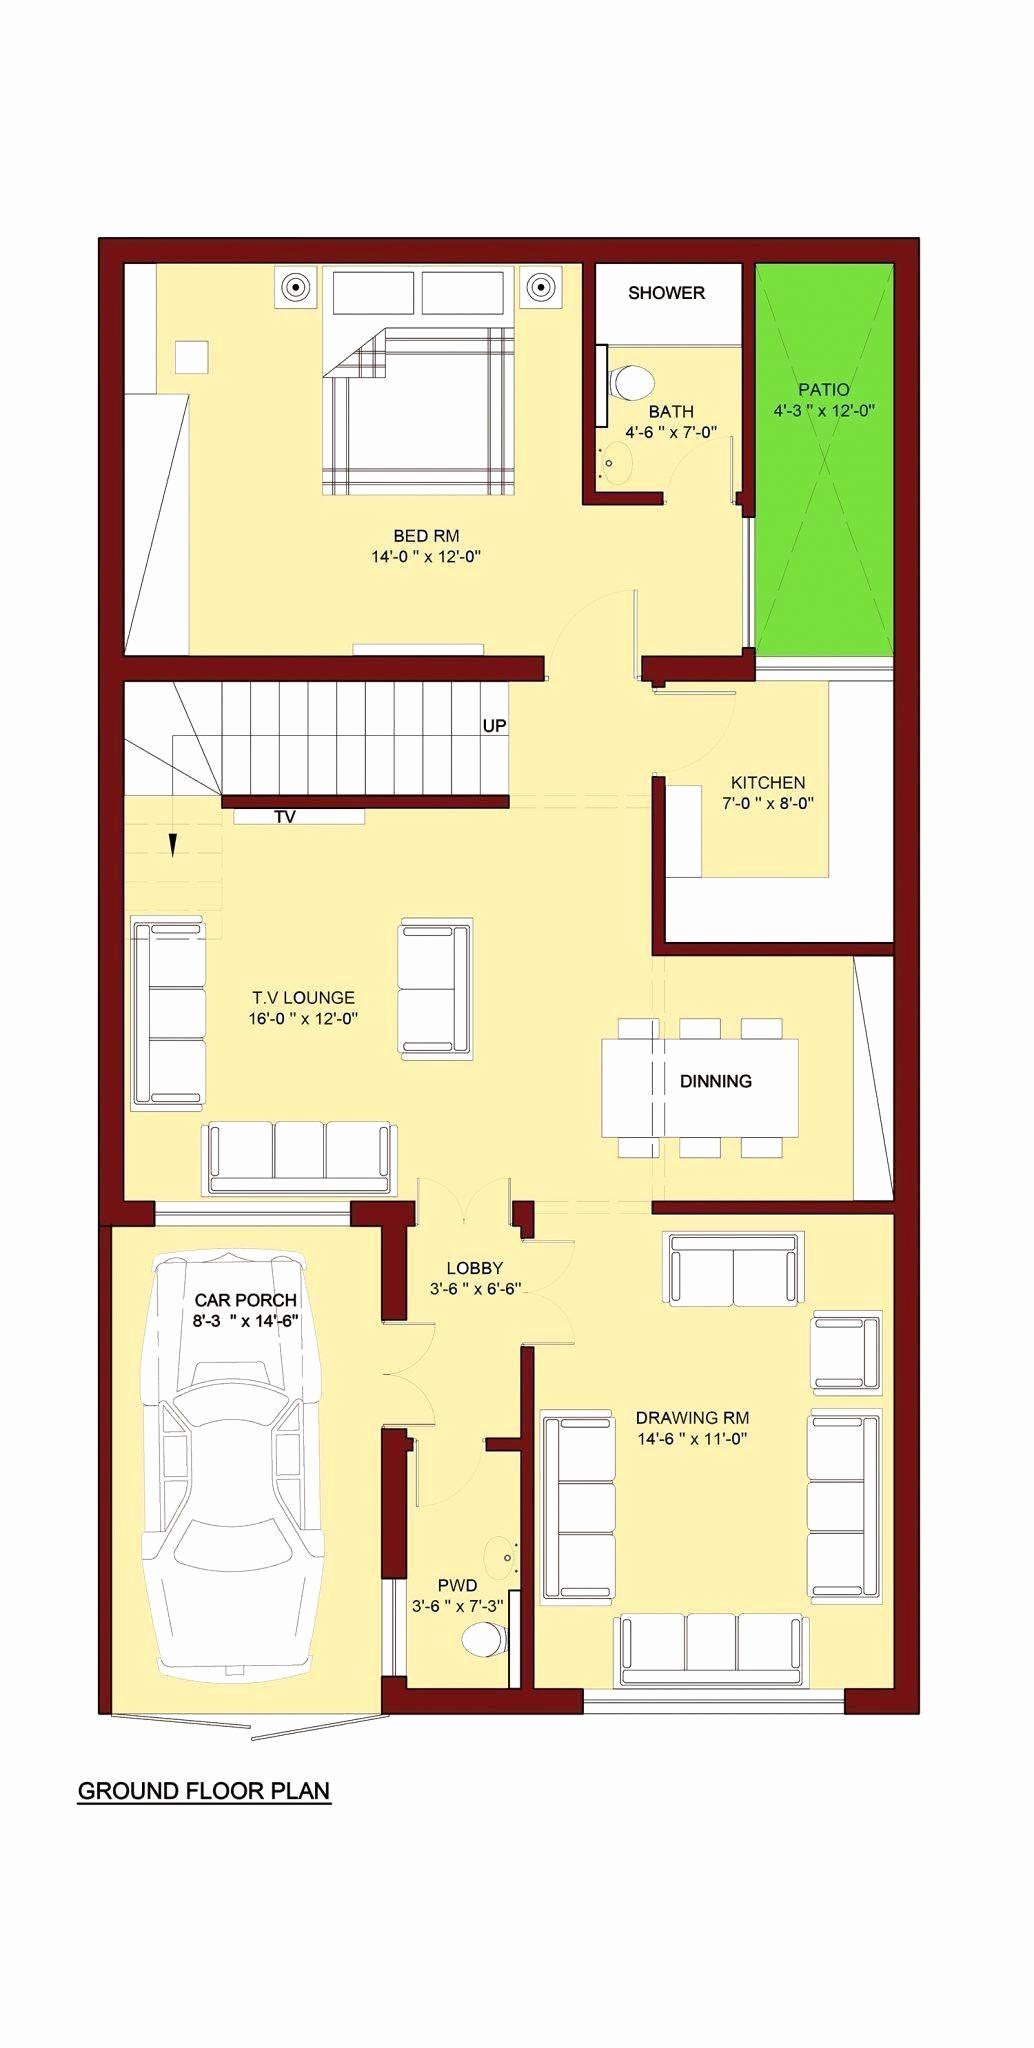 1034x2048 rit building floor plans beautiful simple house floor plan